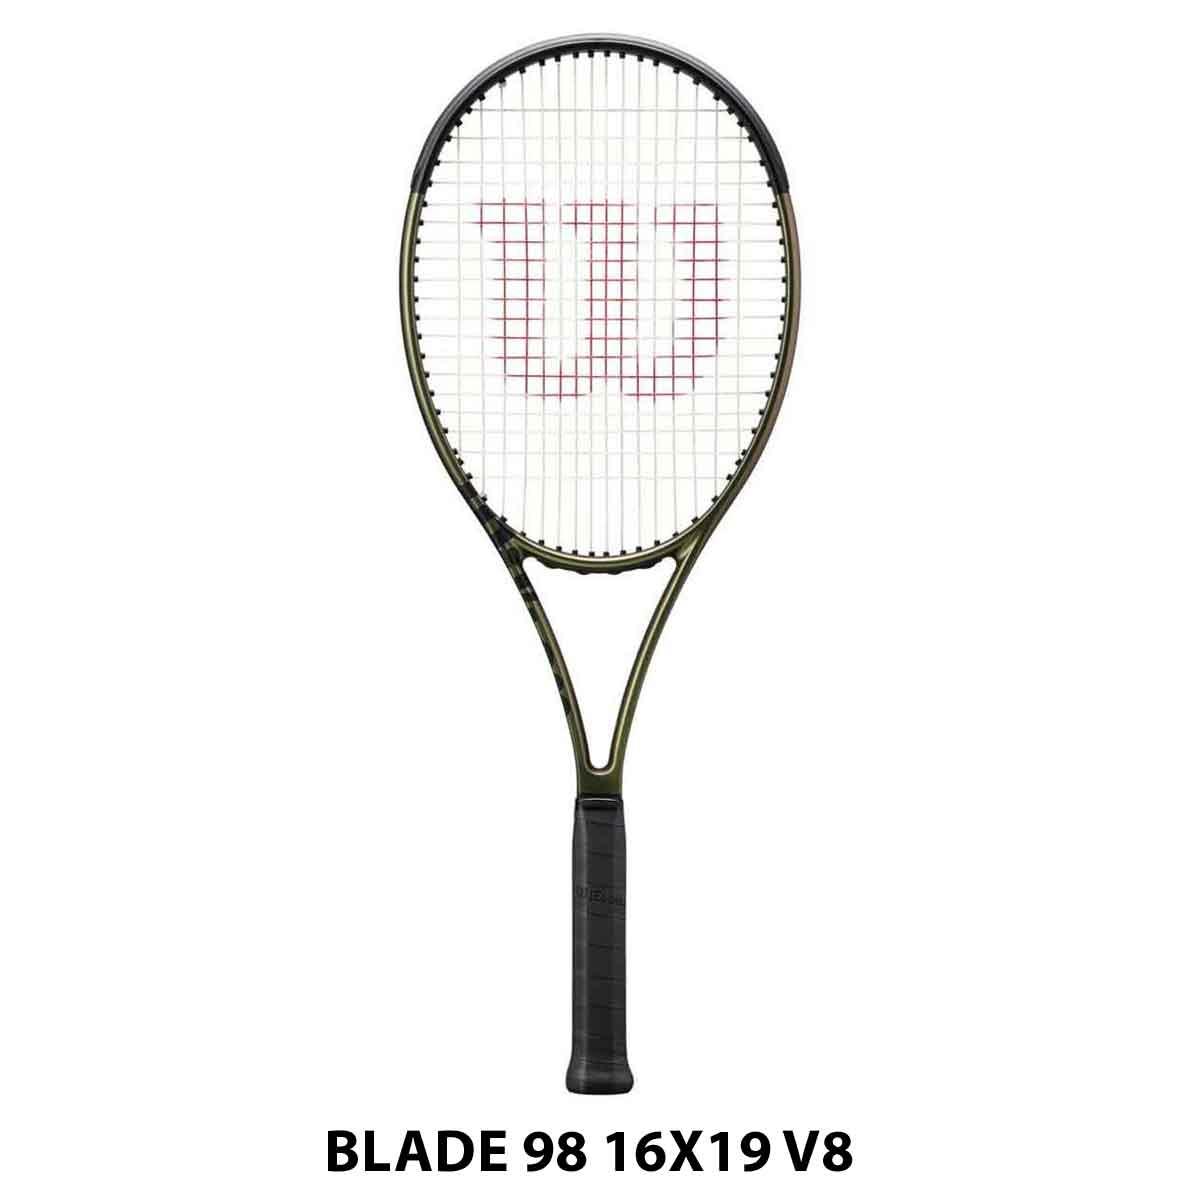 WILSON BLADE 98 16X19 V8